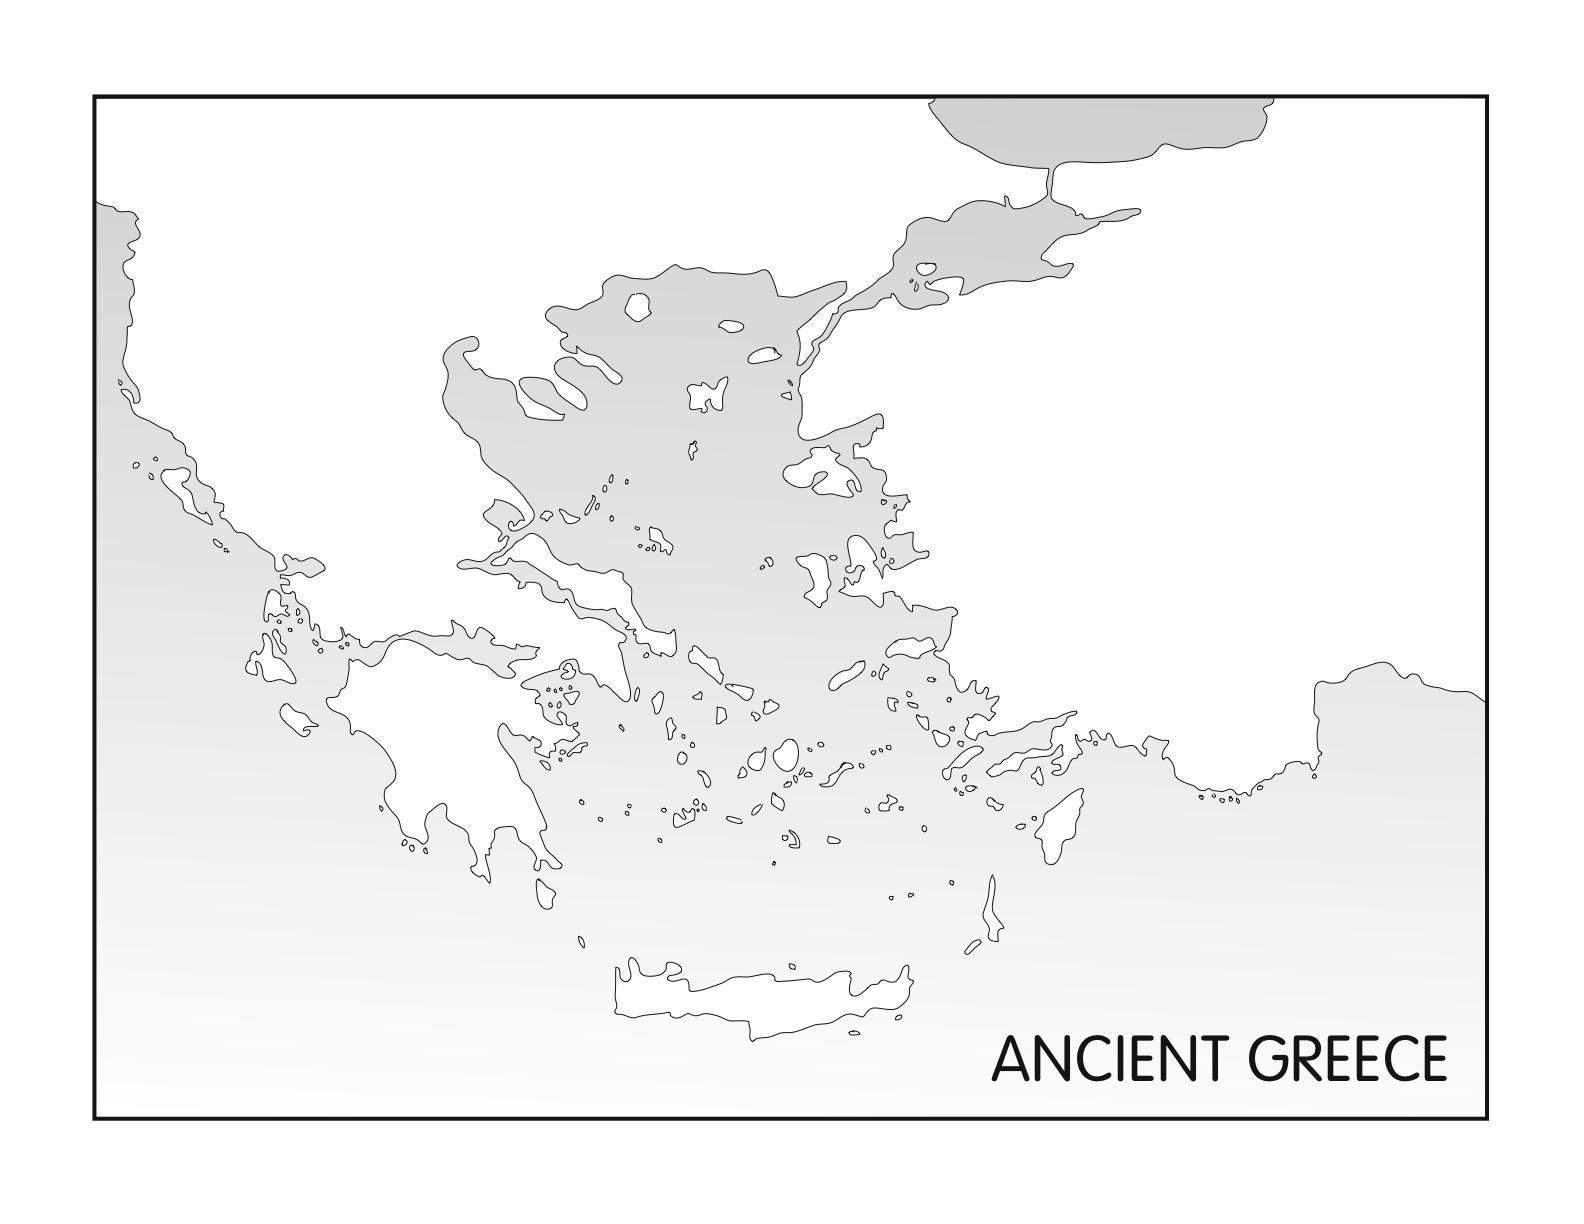 Slepa Mapa Staroveke Recko Staroveke Recko Prazdne Mape Jizni